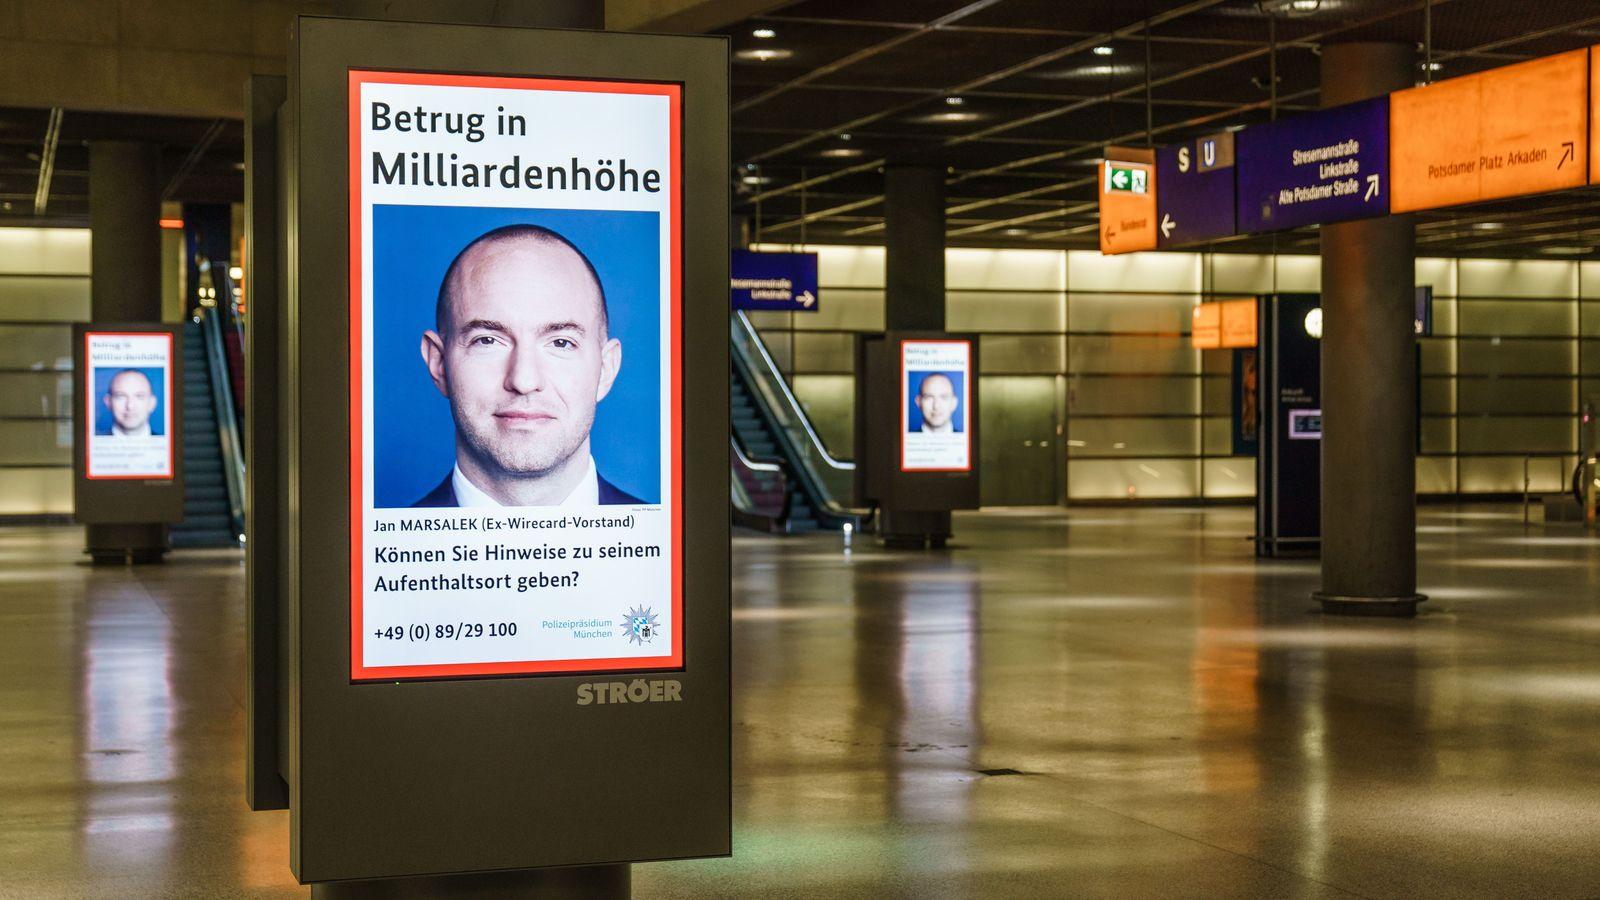 German police advertises wanted poster of Wirecard management member Marsalek, Berlin, Germany - 13 Aug 2020